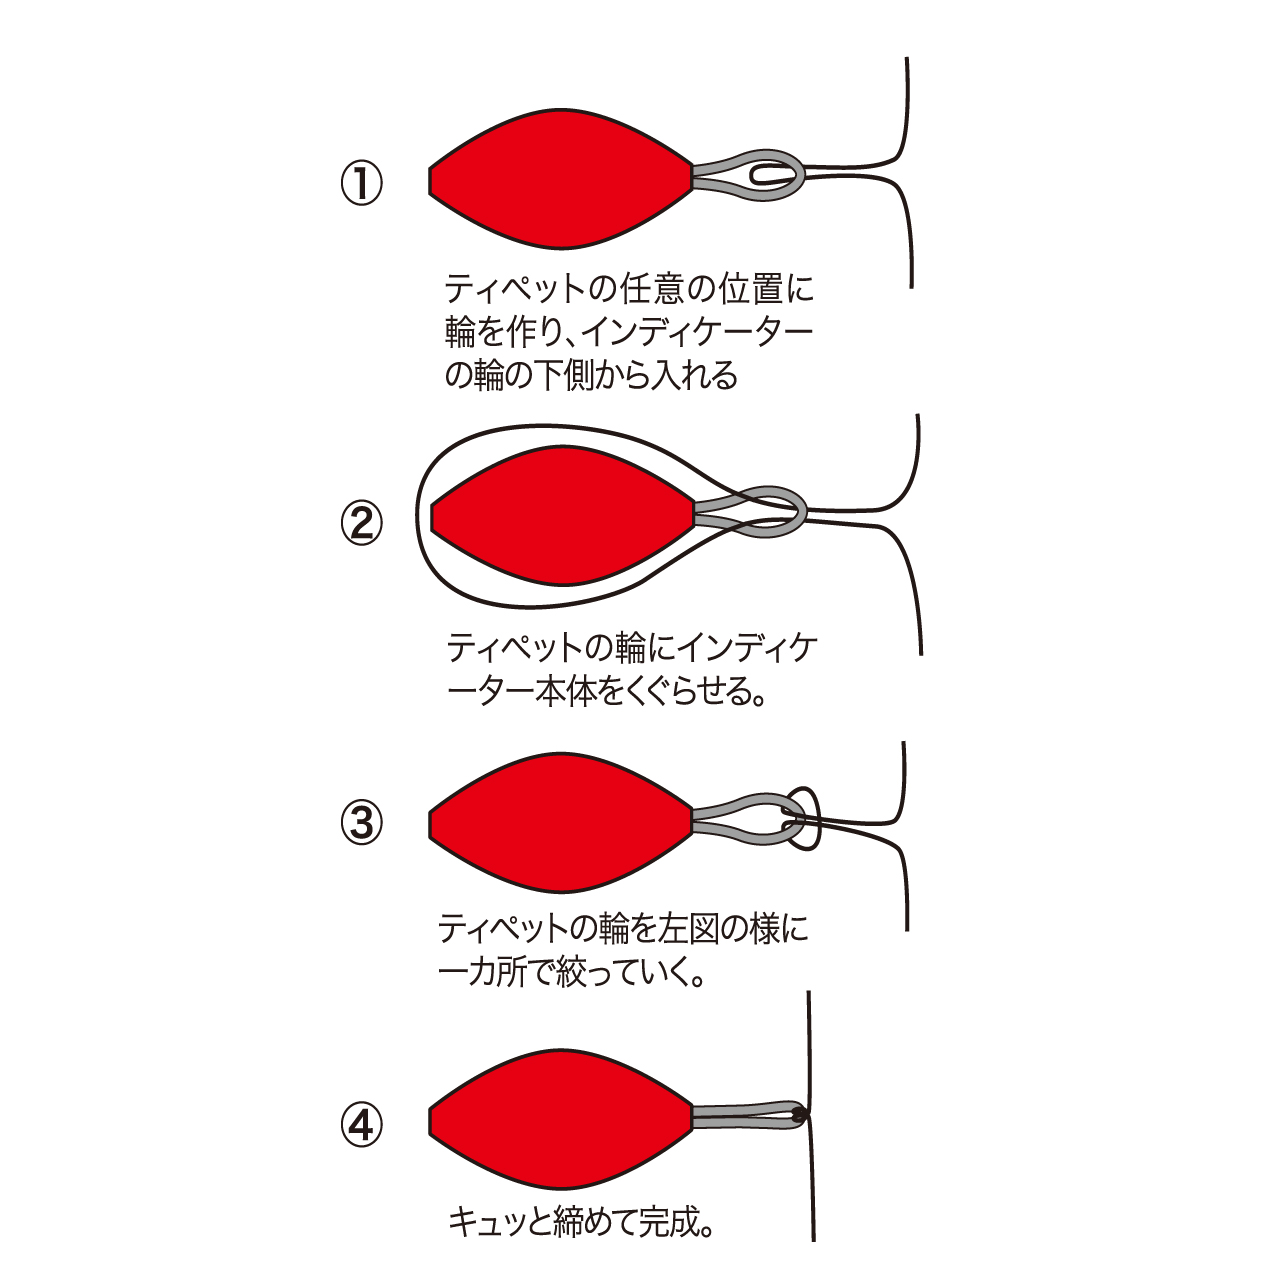 TMC Loop Indicator